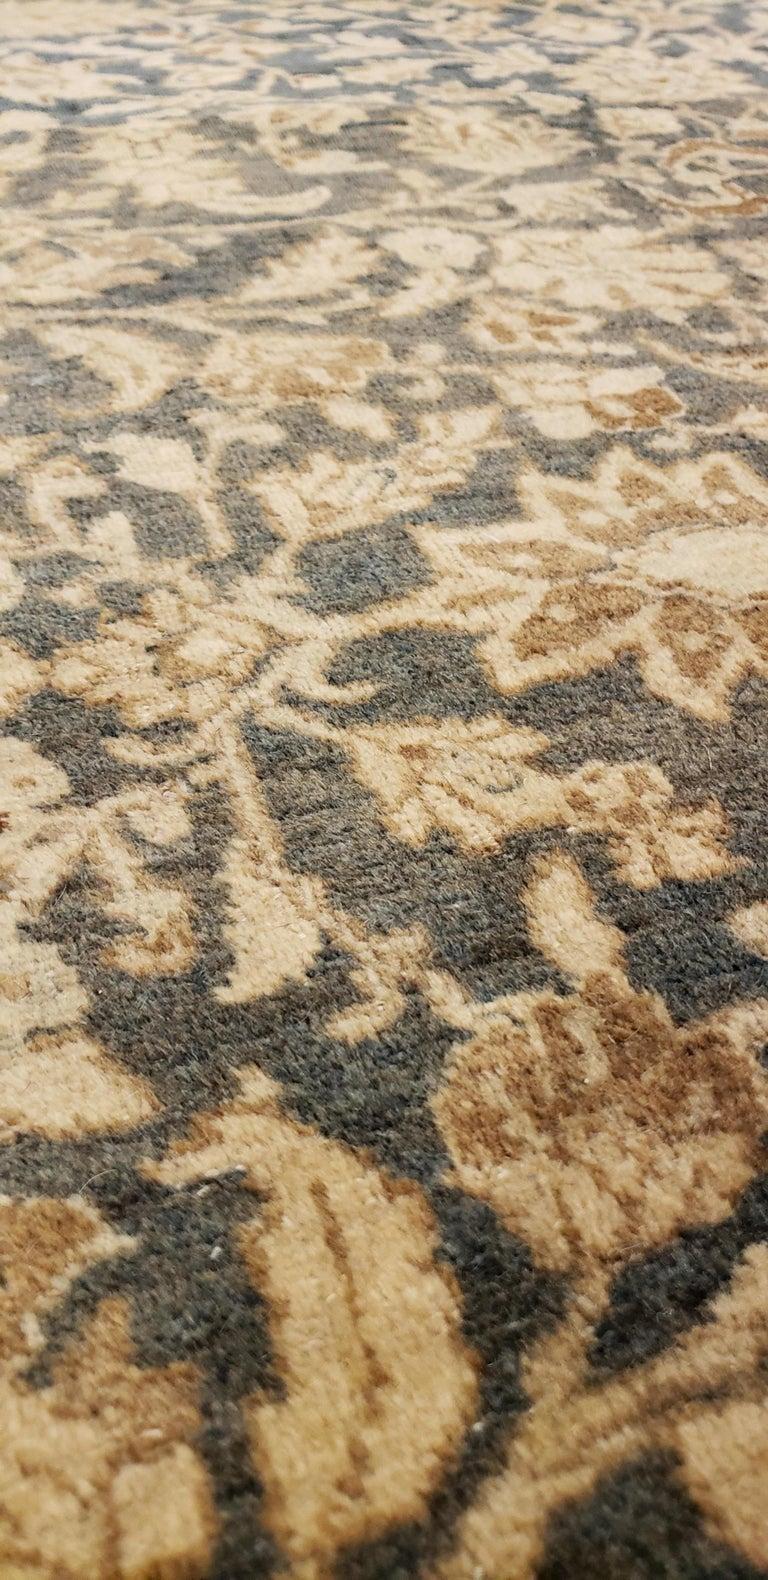 Wool Antique Persian Tabriz Carpet, Handmade Oriental Rug, Beige, Gray/Blue, Taupe For Sale